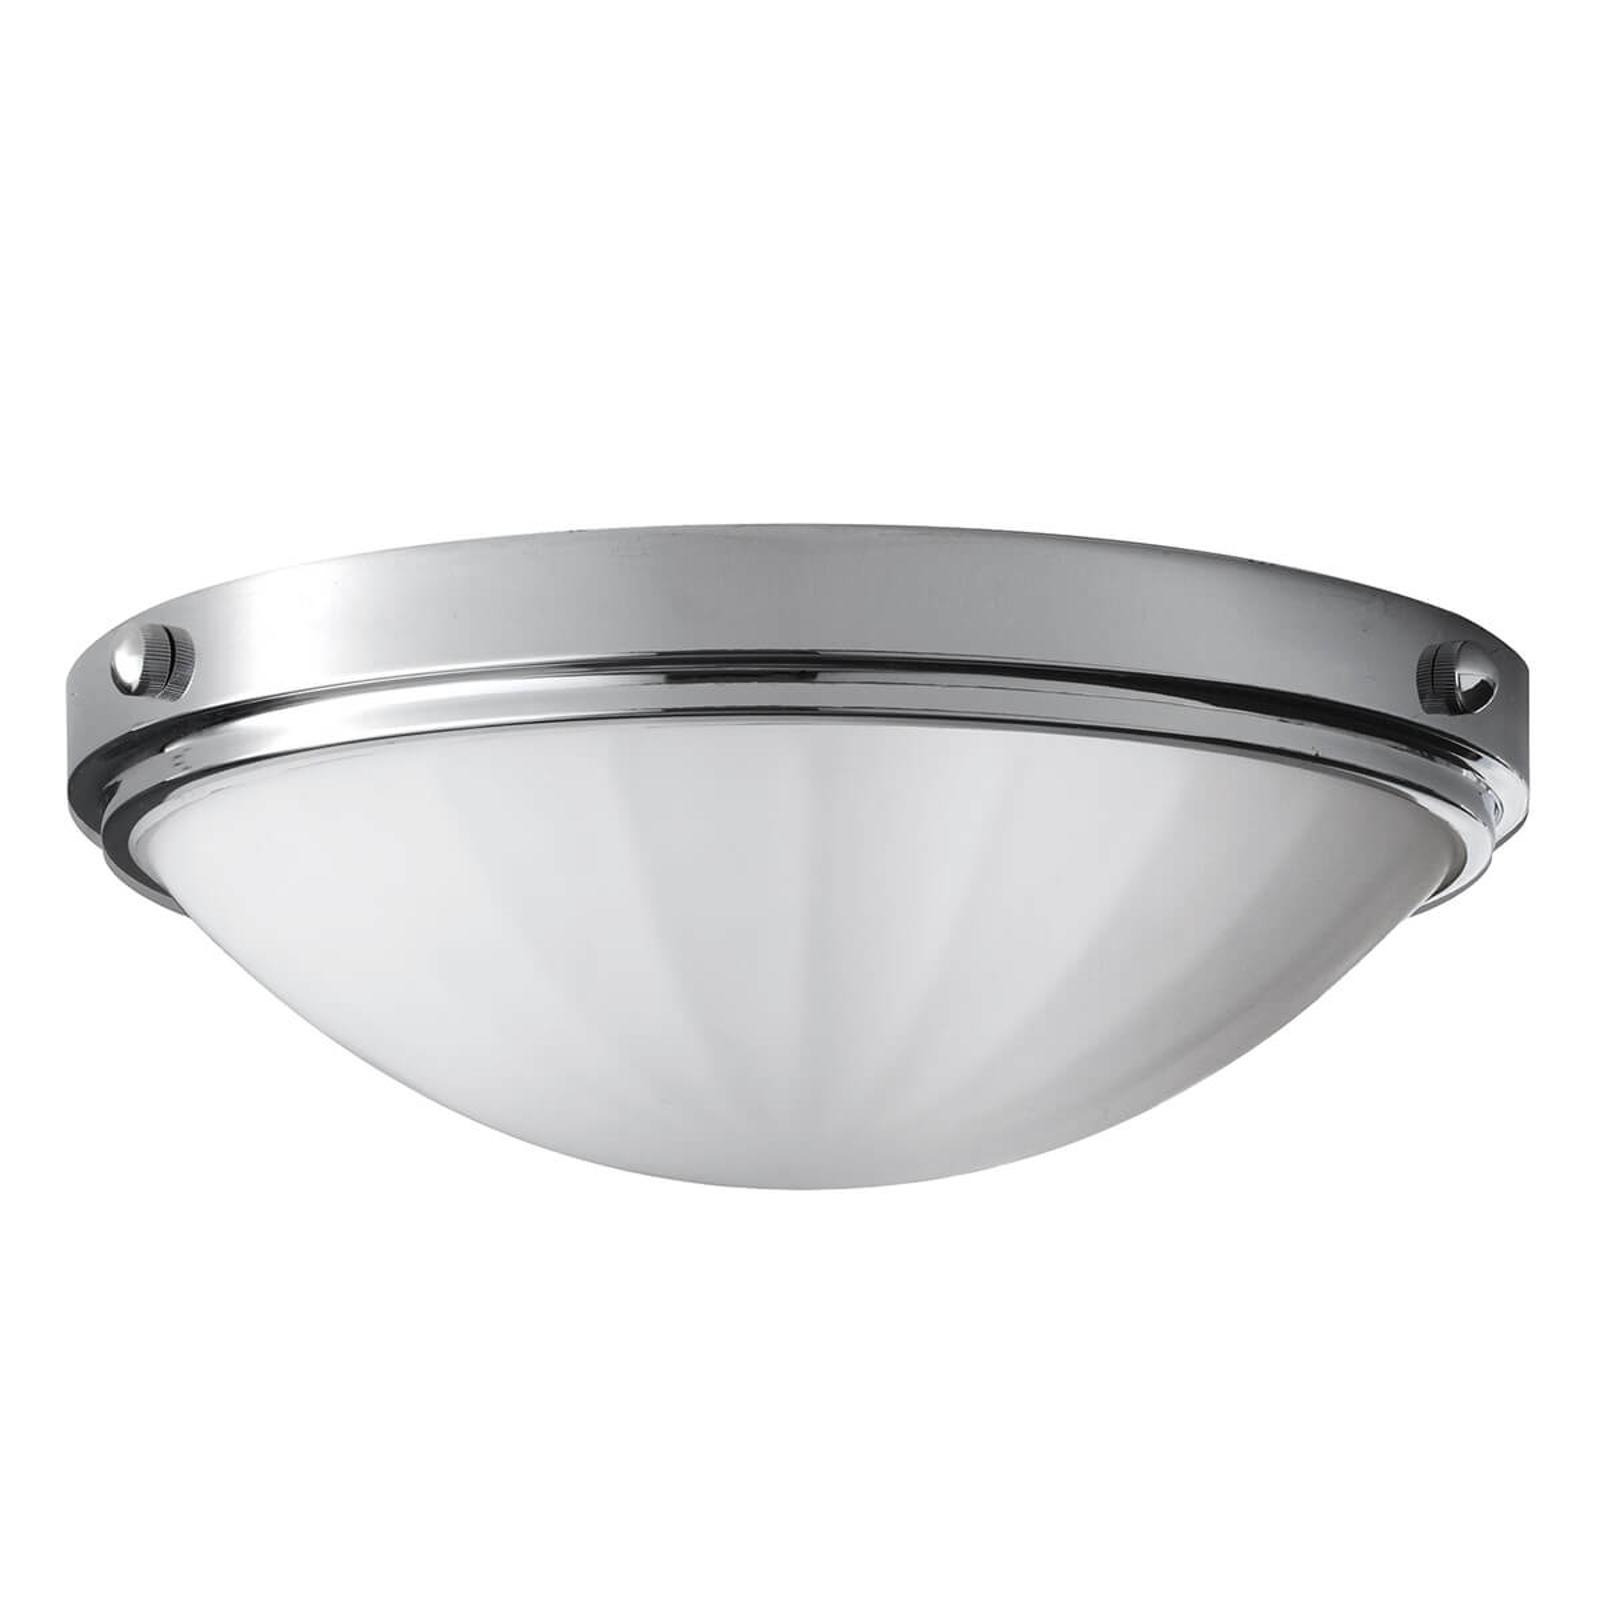 Plafondlamp Perry voor badkamers